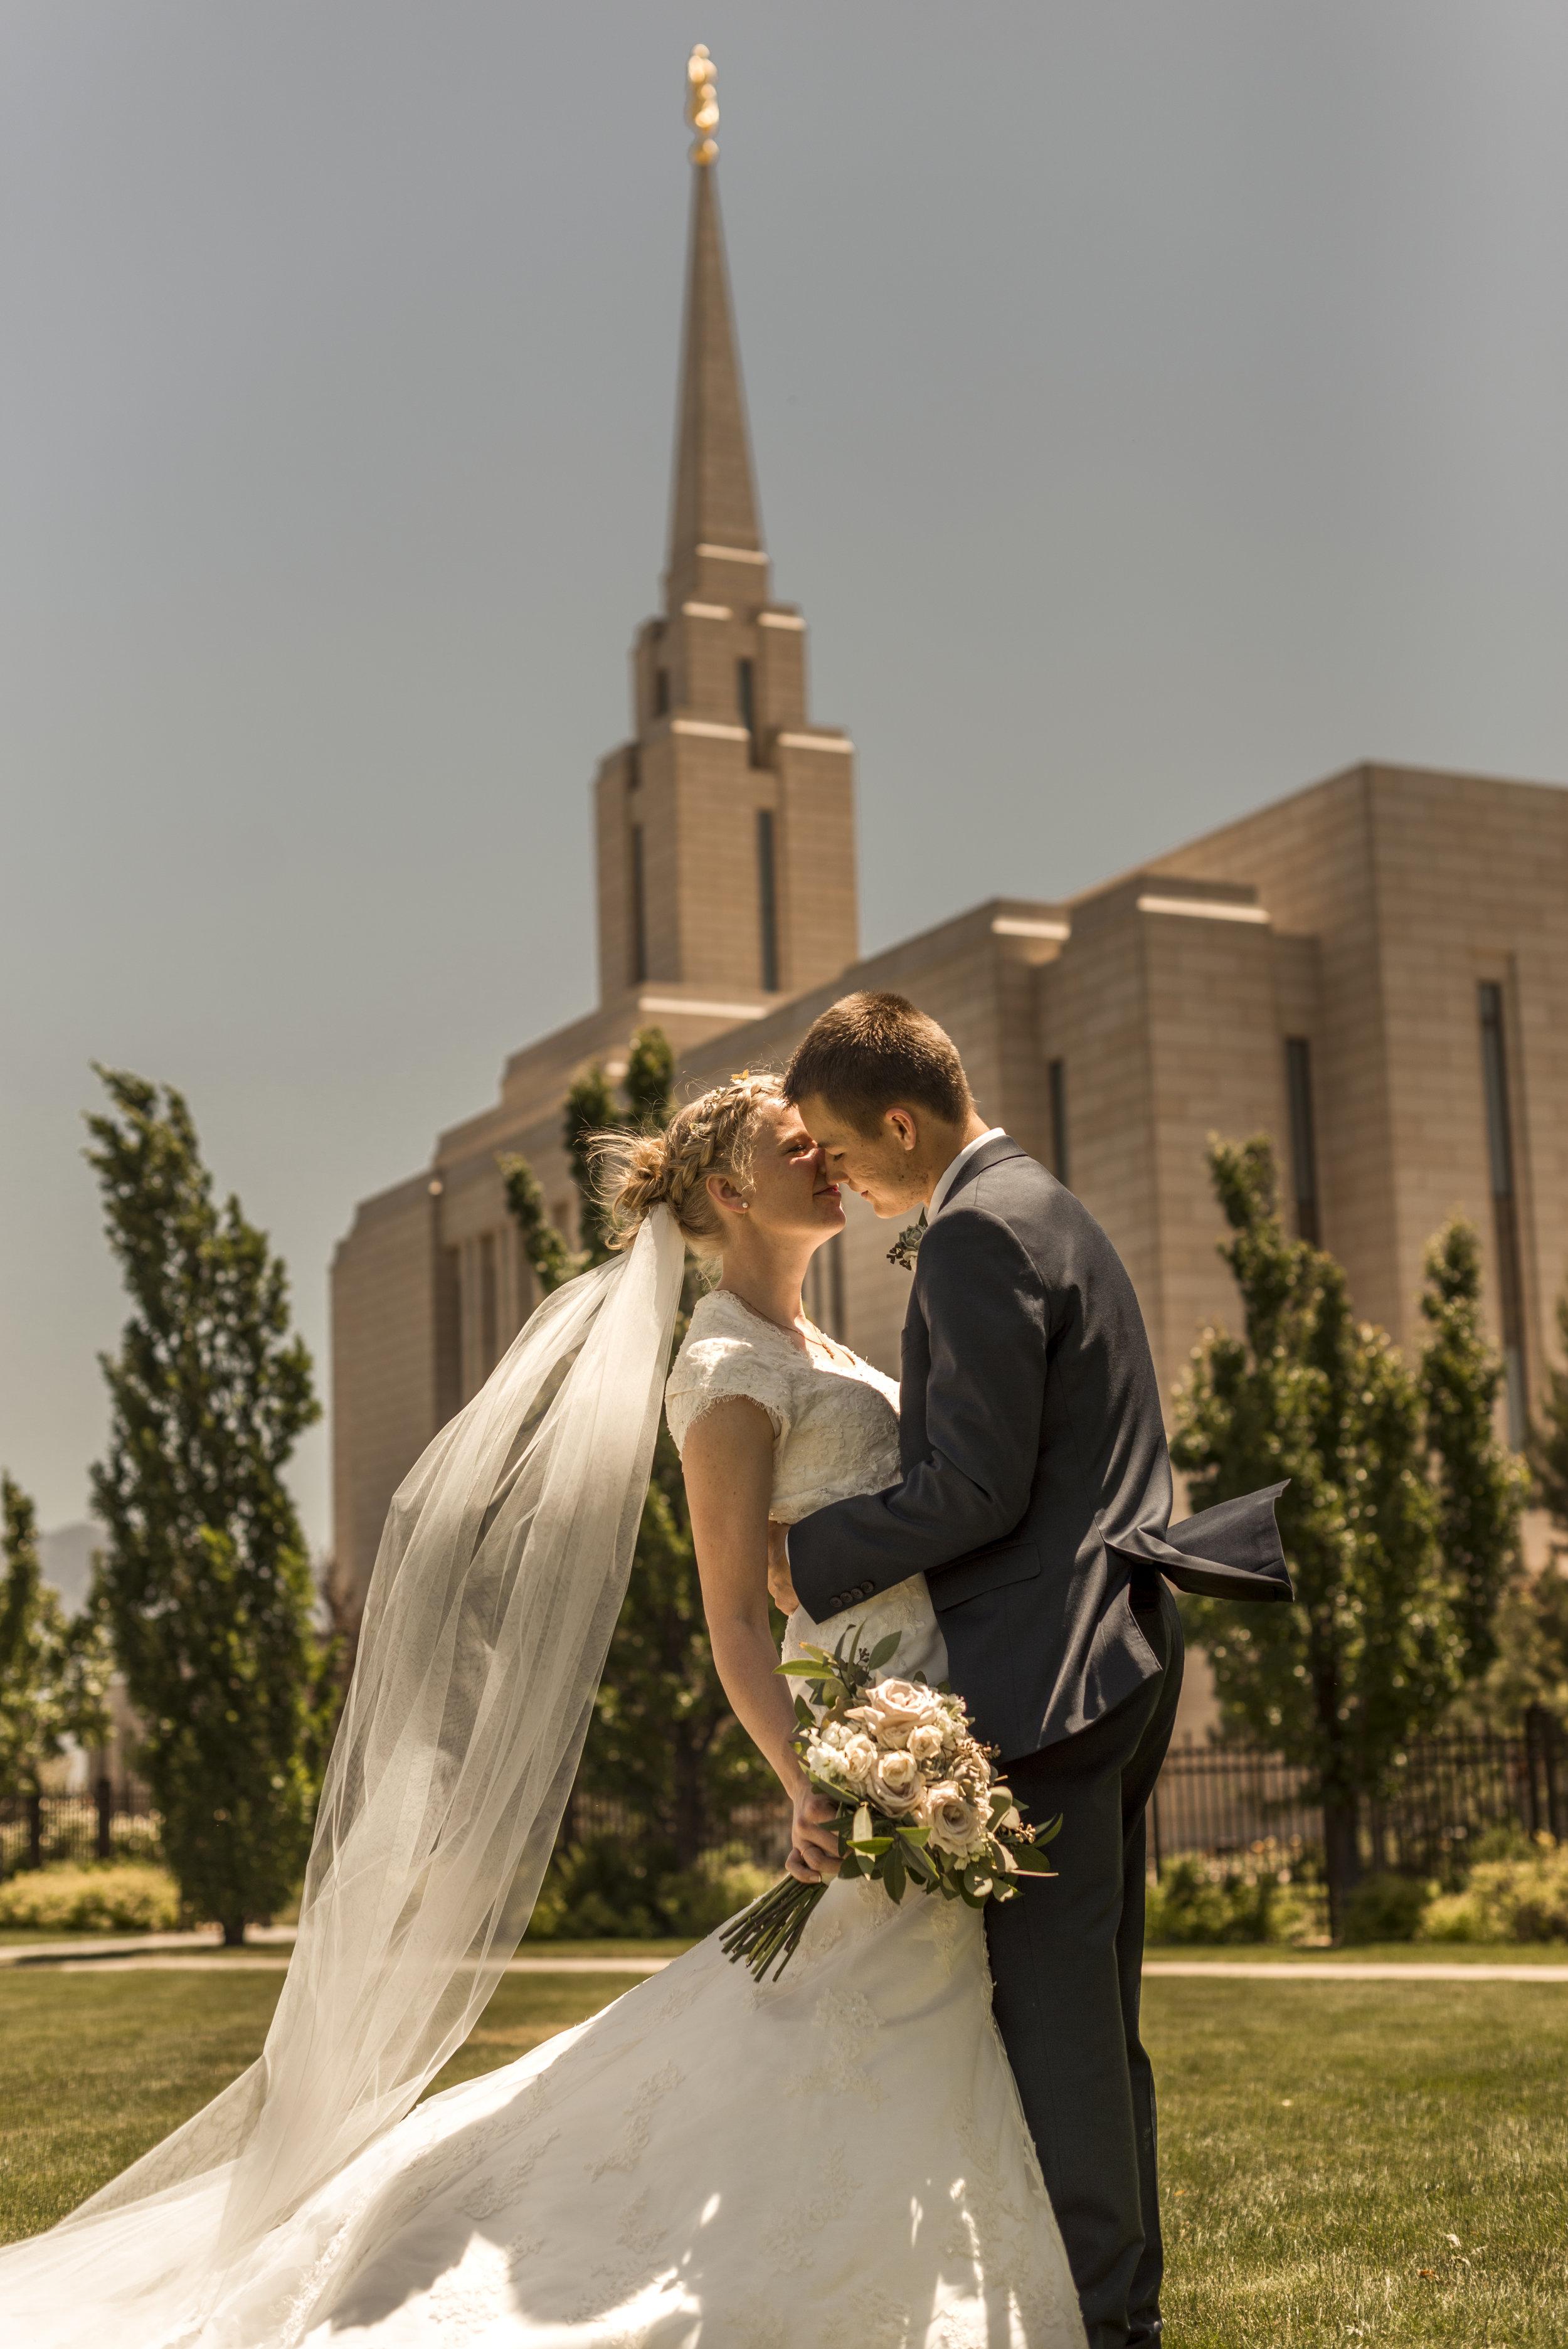 LDS Summer Wedding | South Jordan, Utah Wedding Photographer| Bri Bergman Photography 09.JPG